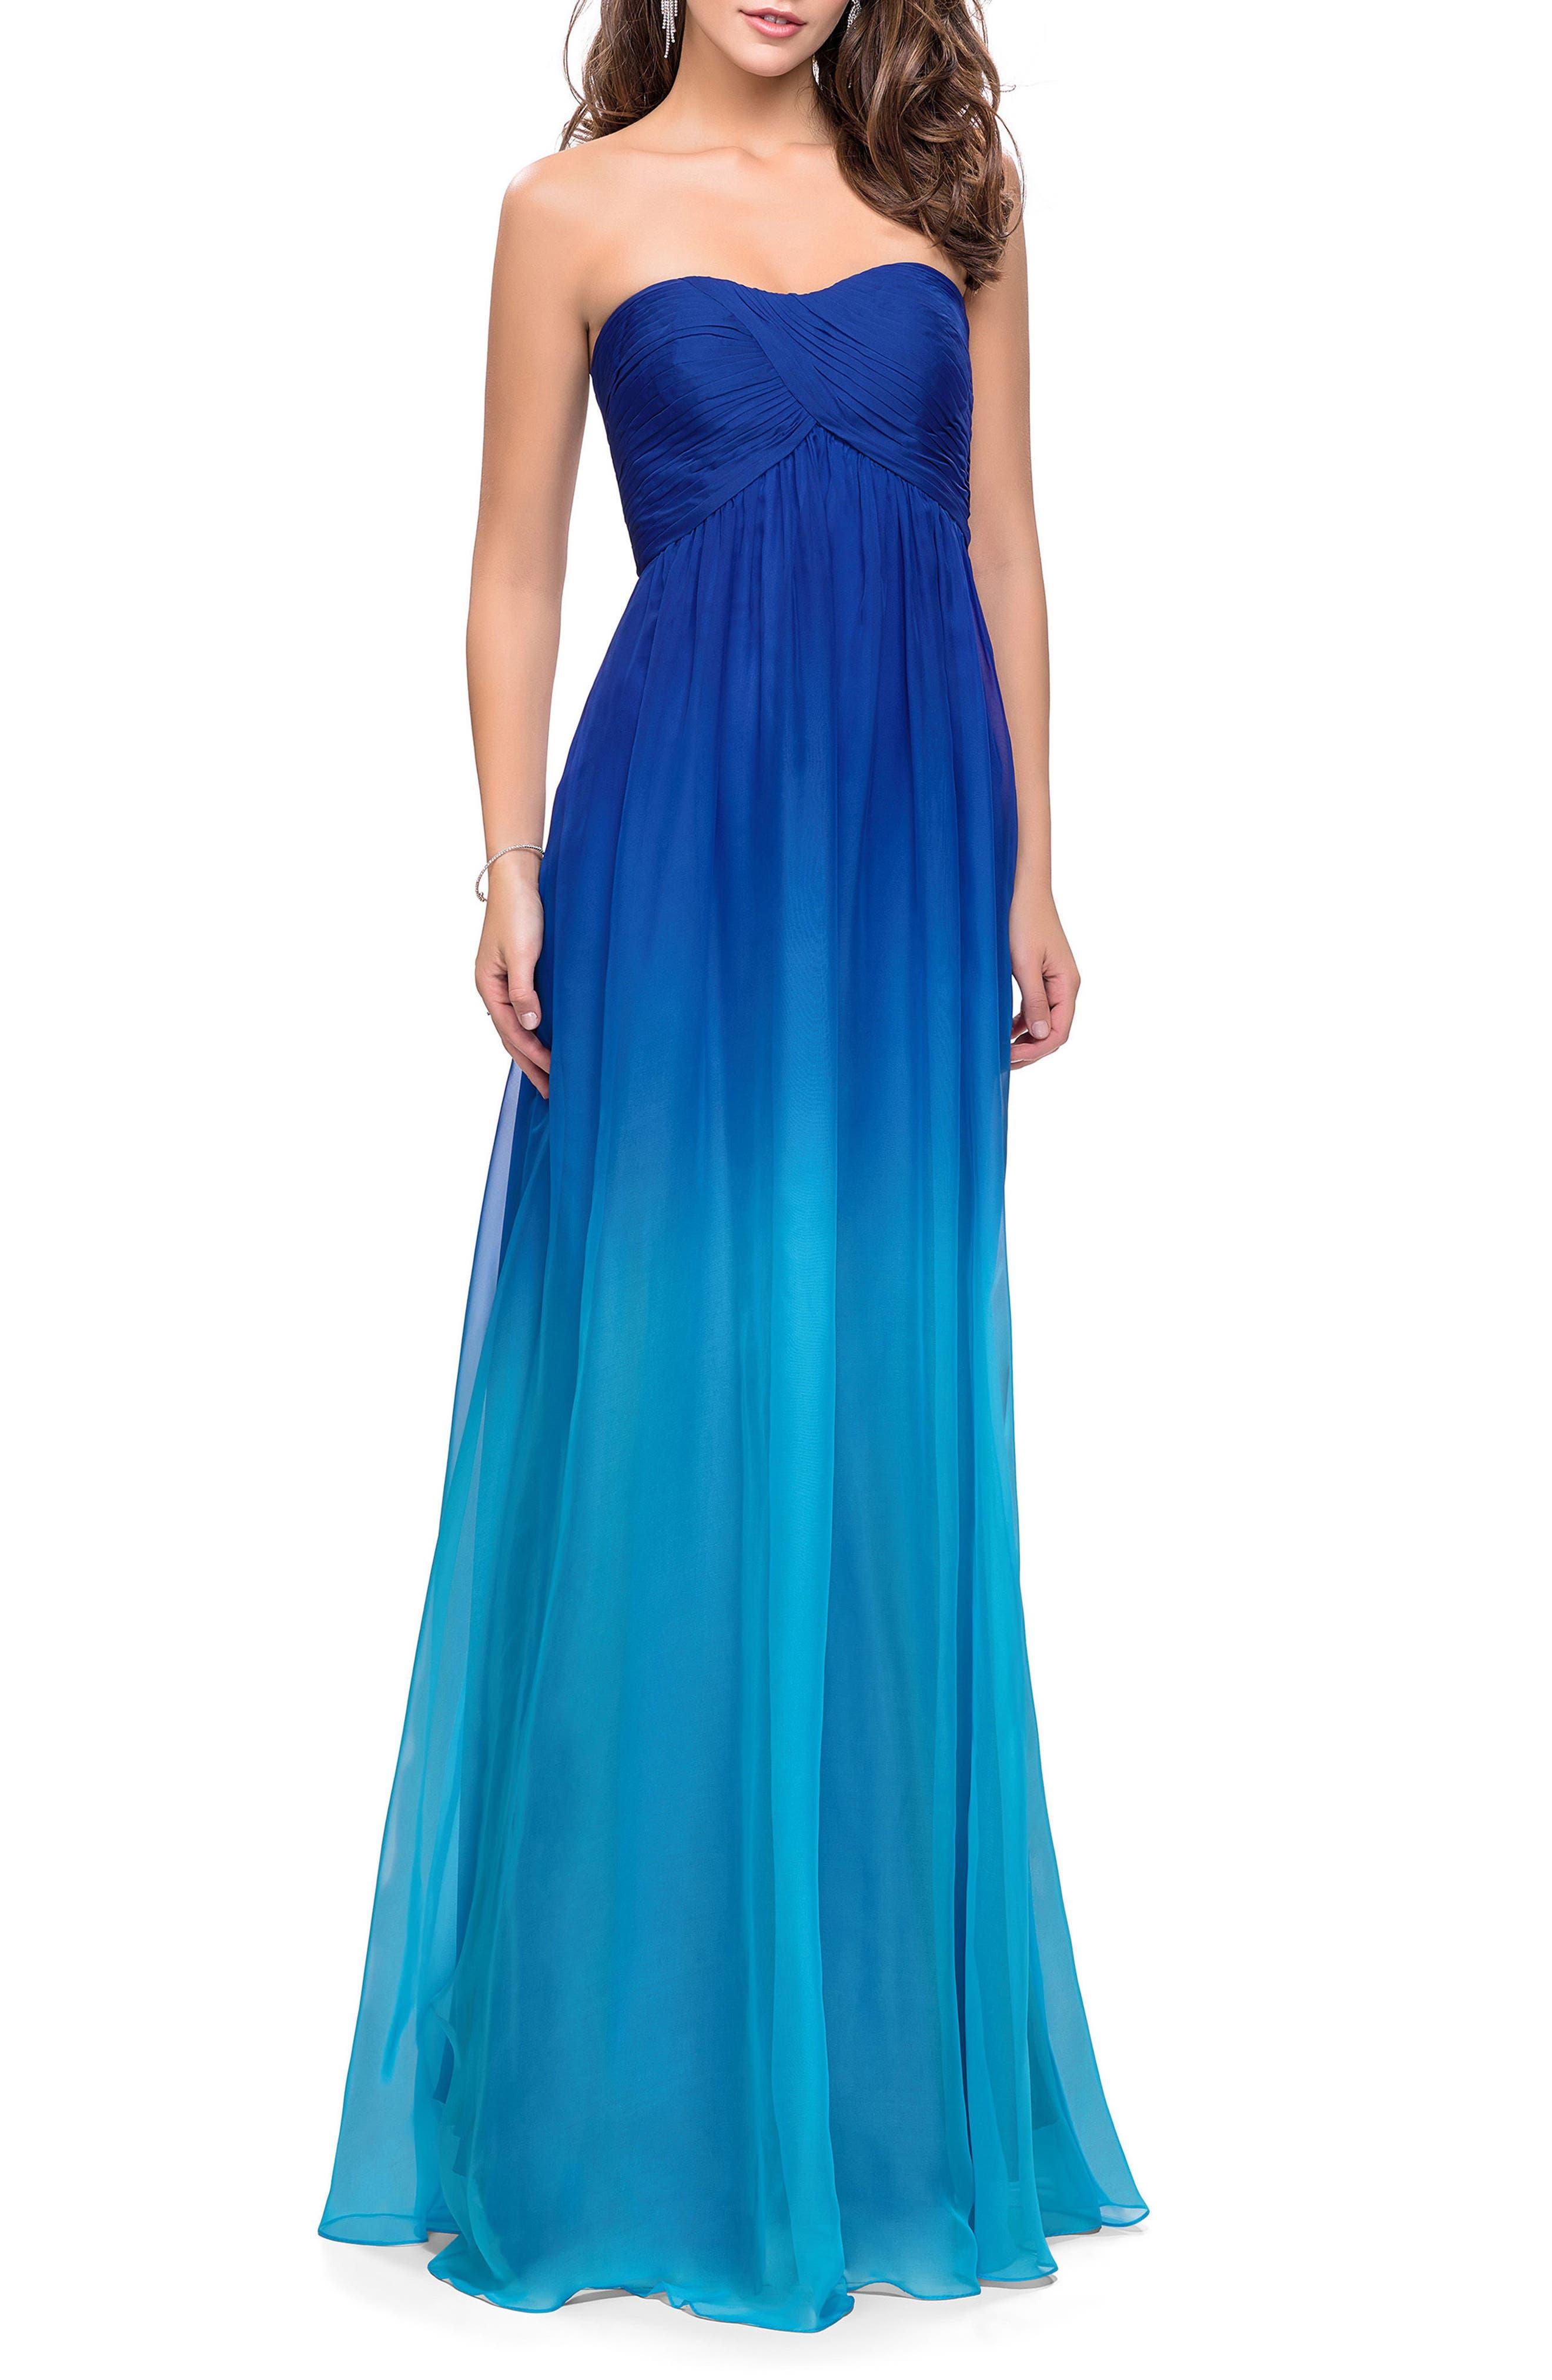 Ruched Ombré Chiffon Strapless Gown,                         Main,                         color, Royal Aqua